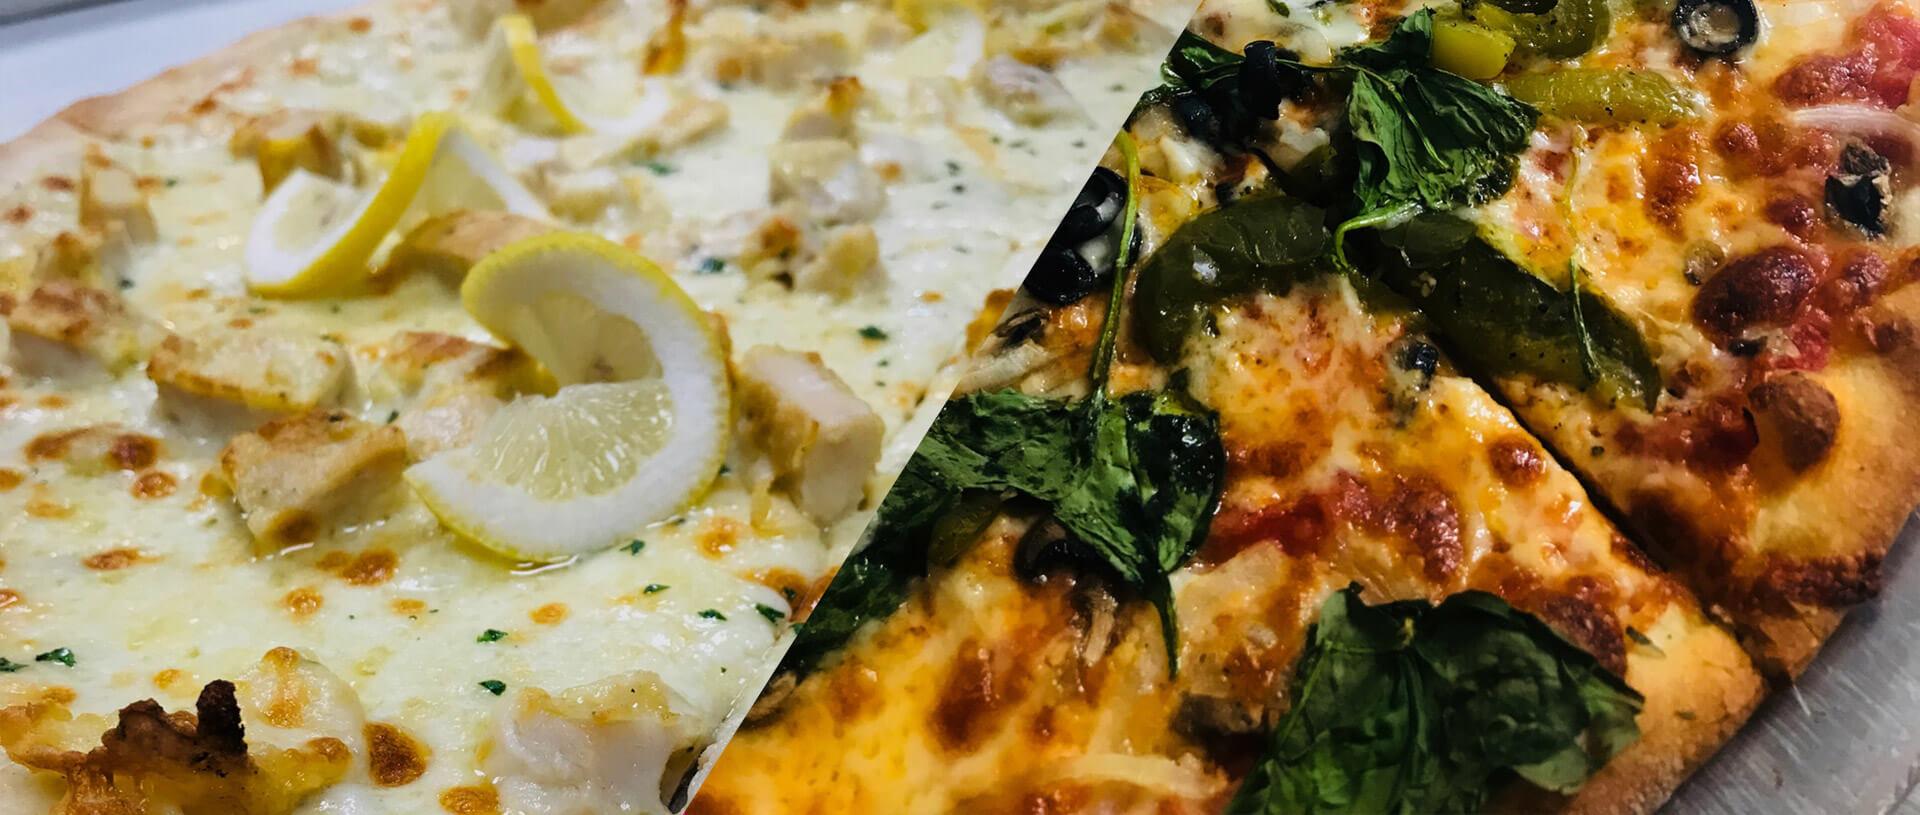 Joeys\' Pizza and Pasta